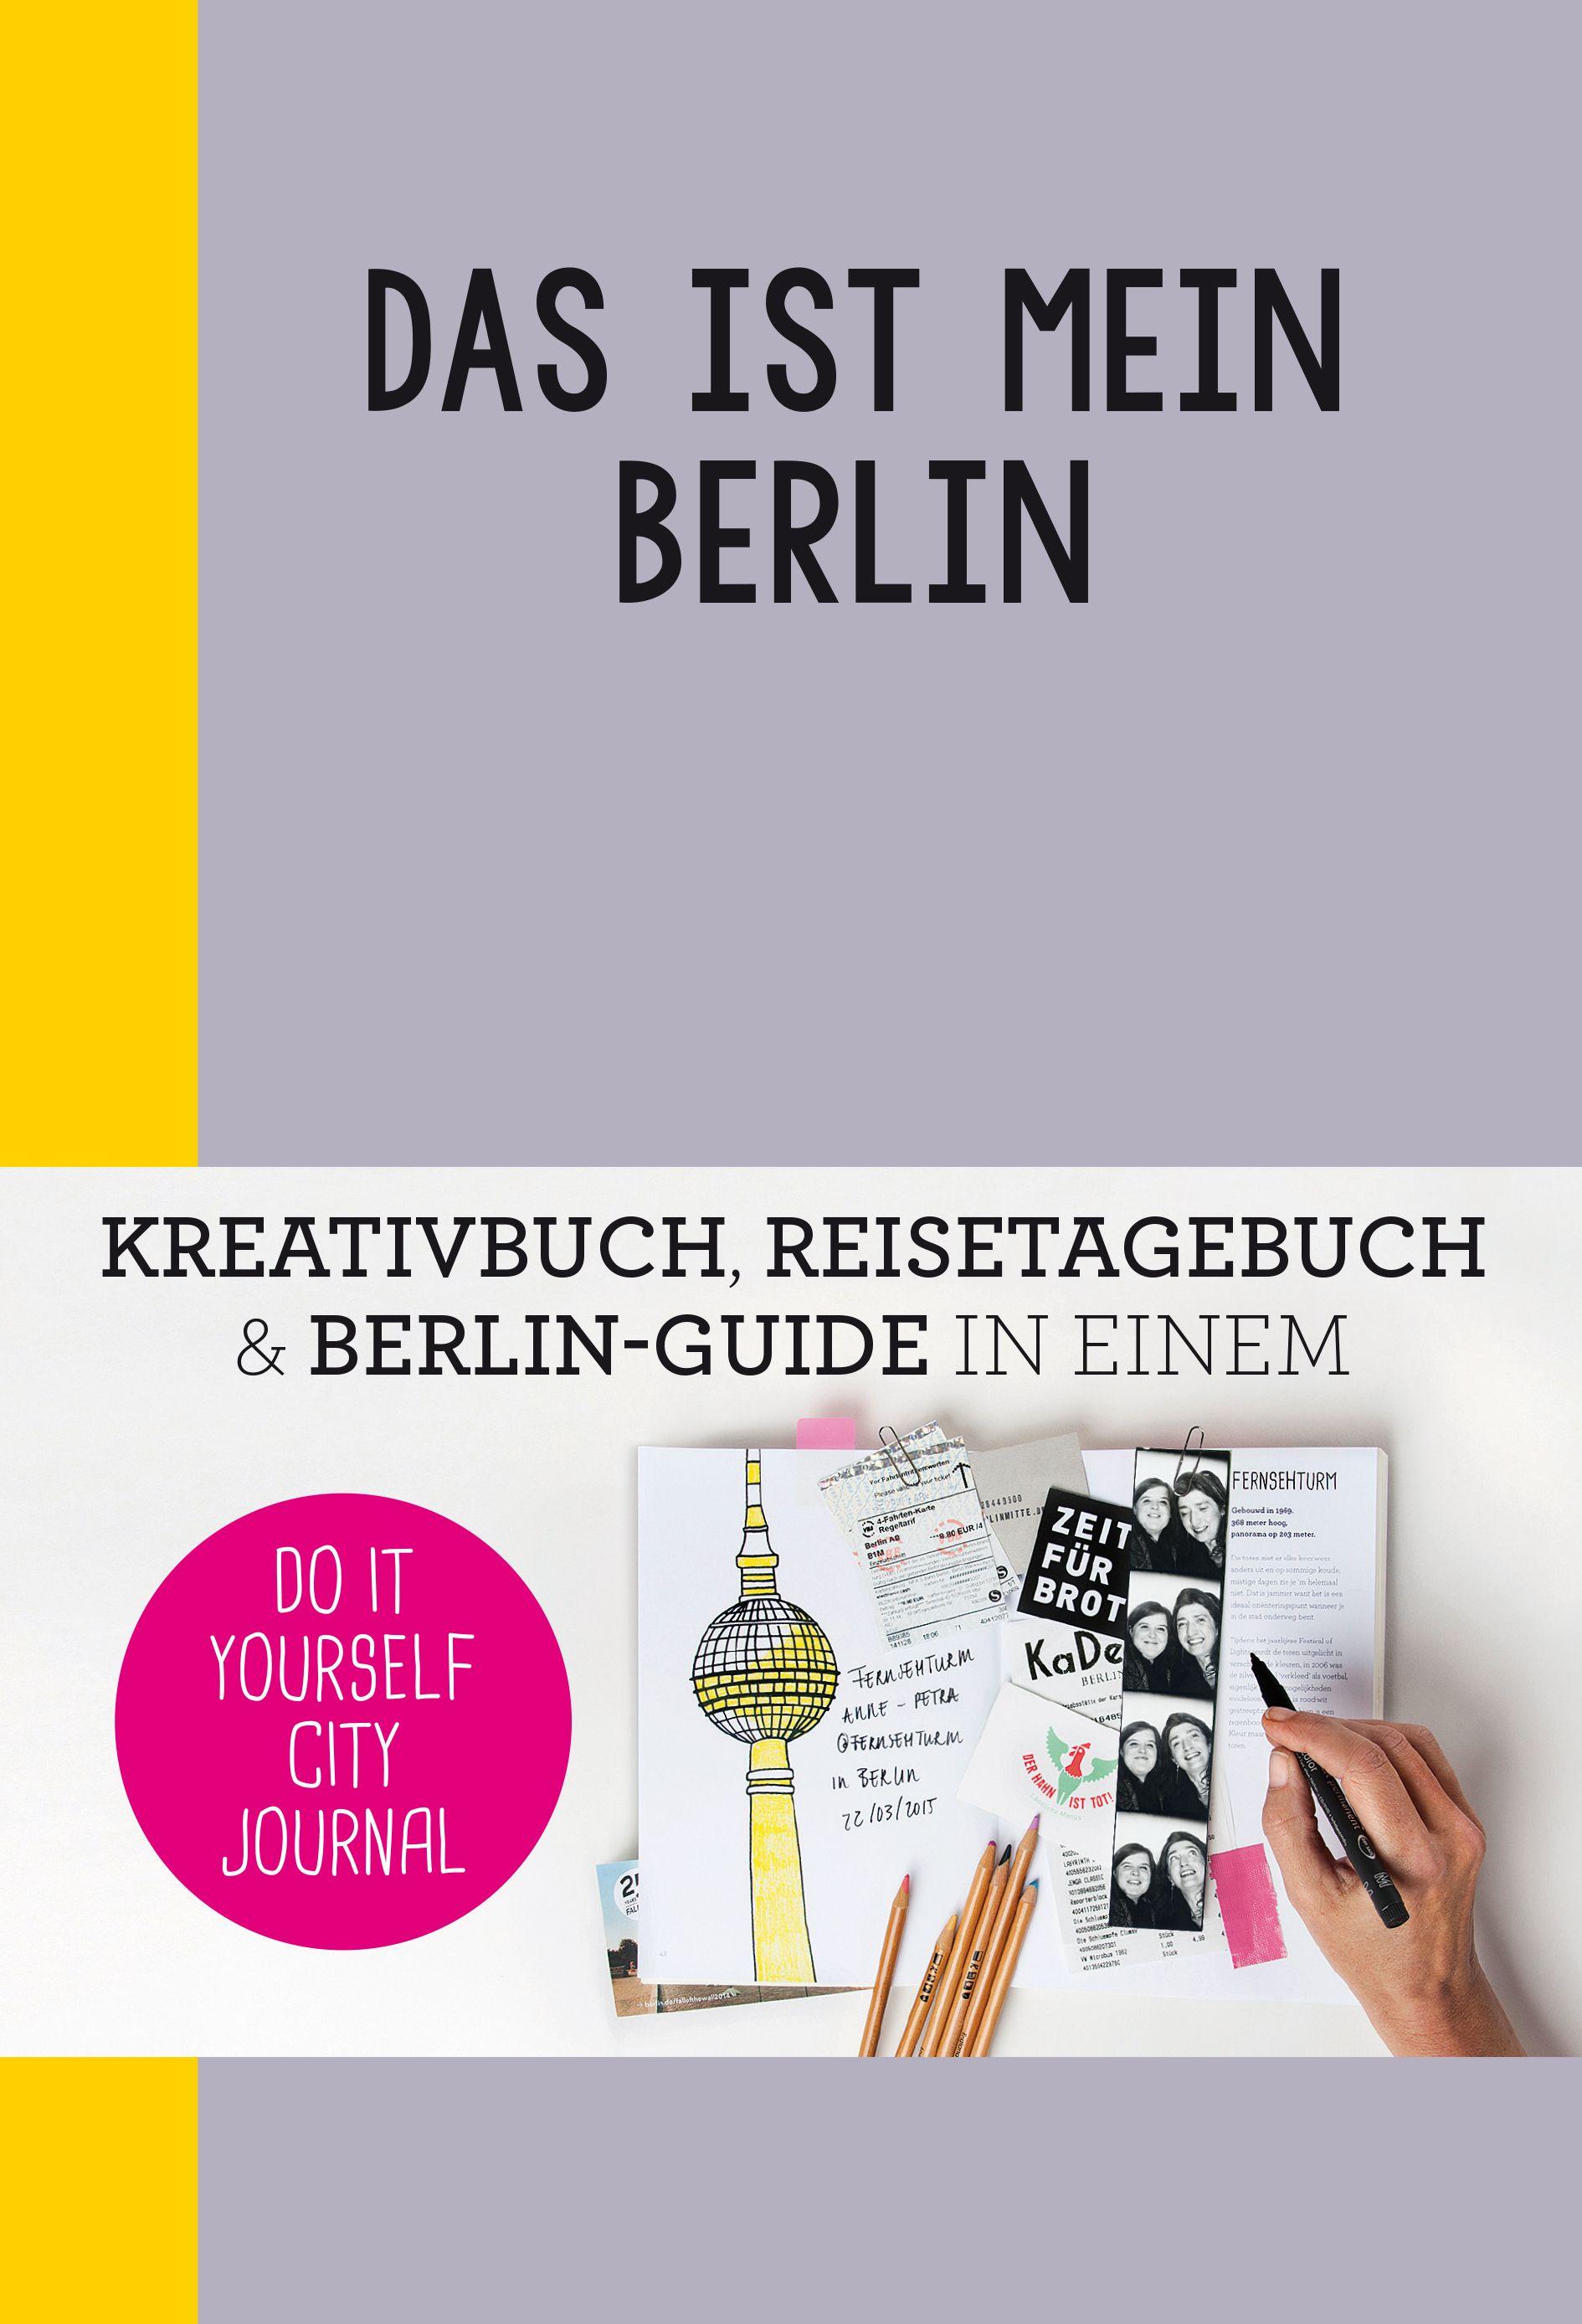 Do it yourself berlin traveljournal reisetagebuch zum basteln do it yourself berlin traveljournal reisetagebuch zum basteln reiseerinnerungen solutioingenieria Images